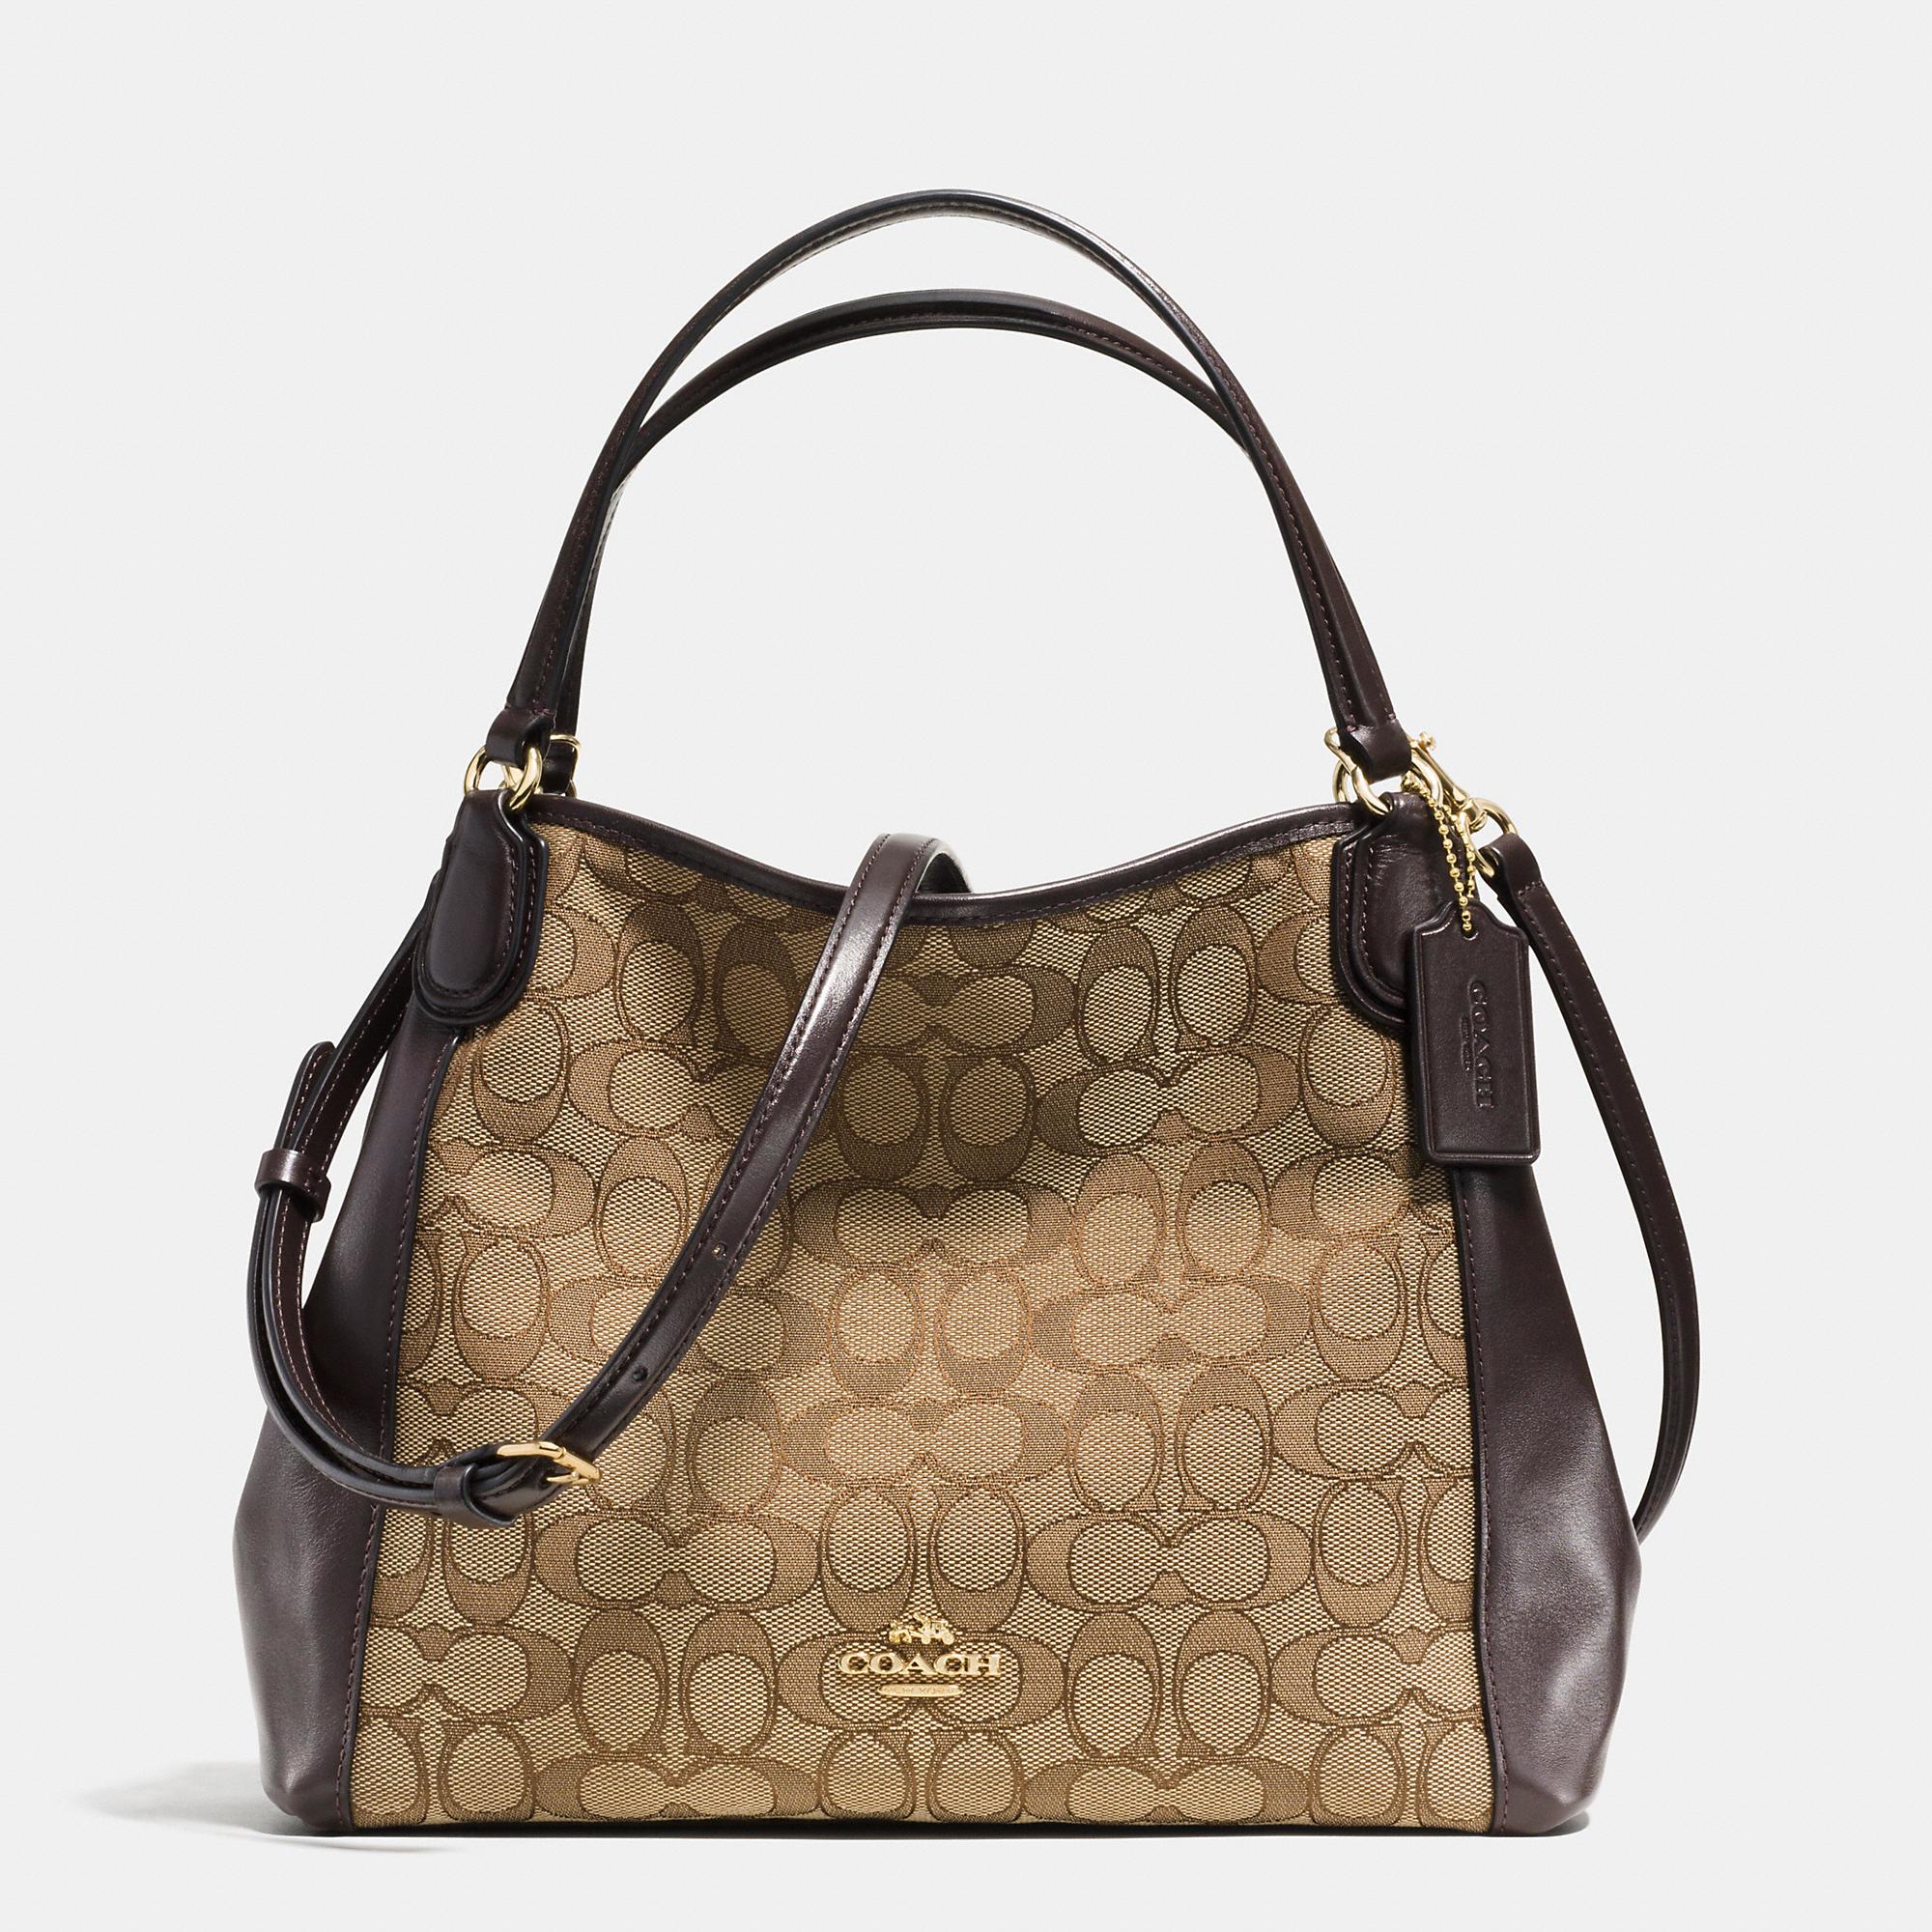 Lyst - COACH Edie Shoulder Bag 28 In Signature Jacquard in Brown 57eea81612840